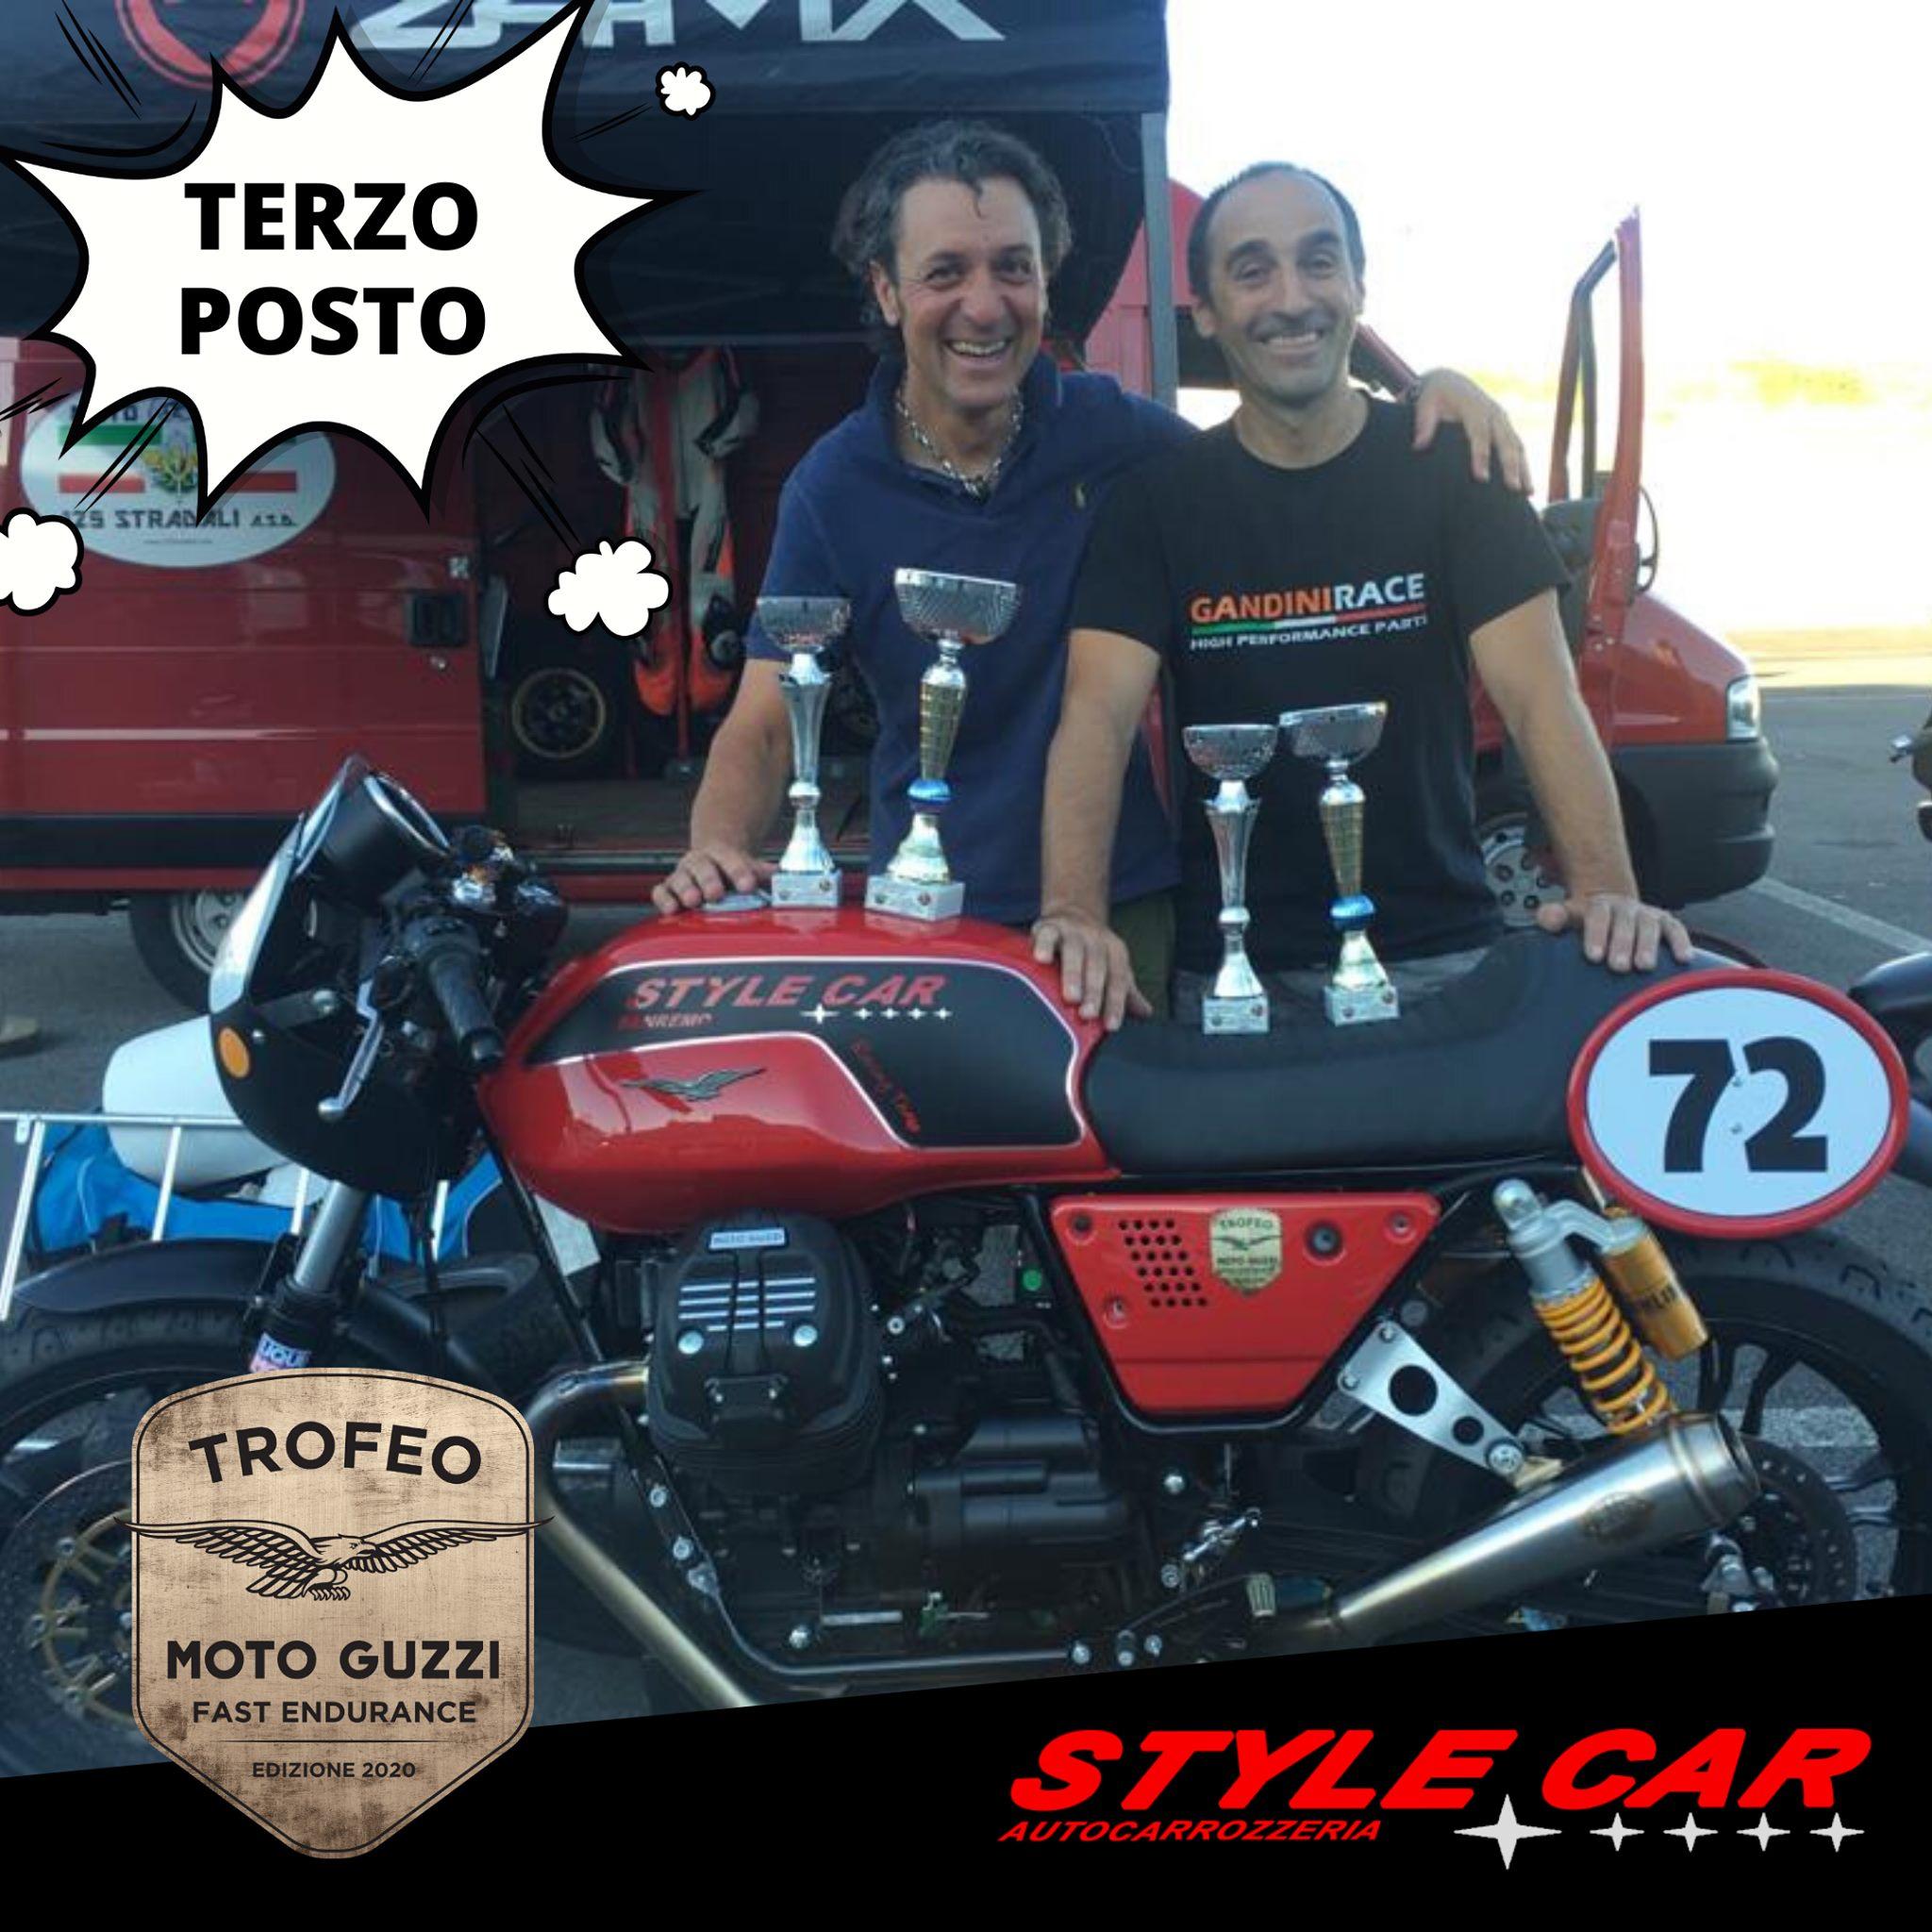 stylecar-motoguzzi-luglio